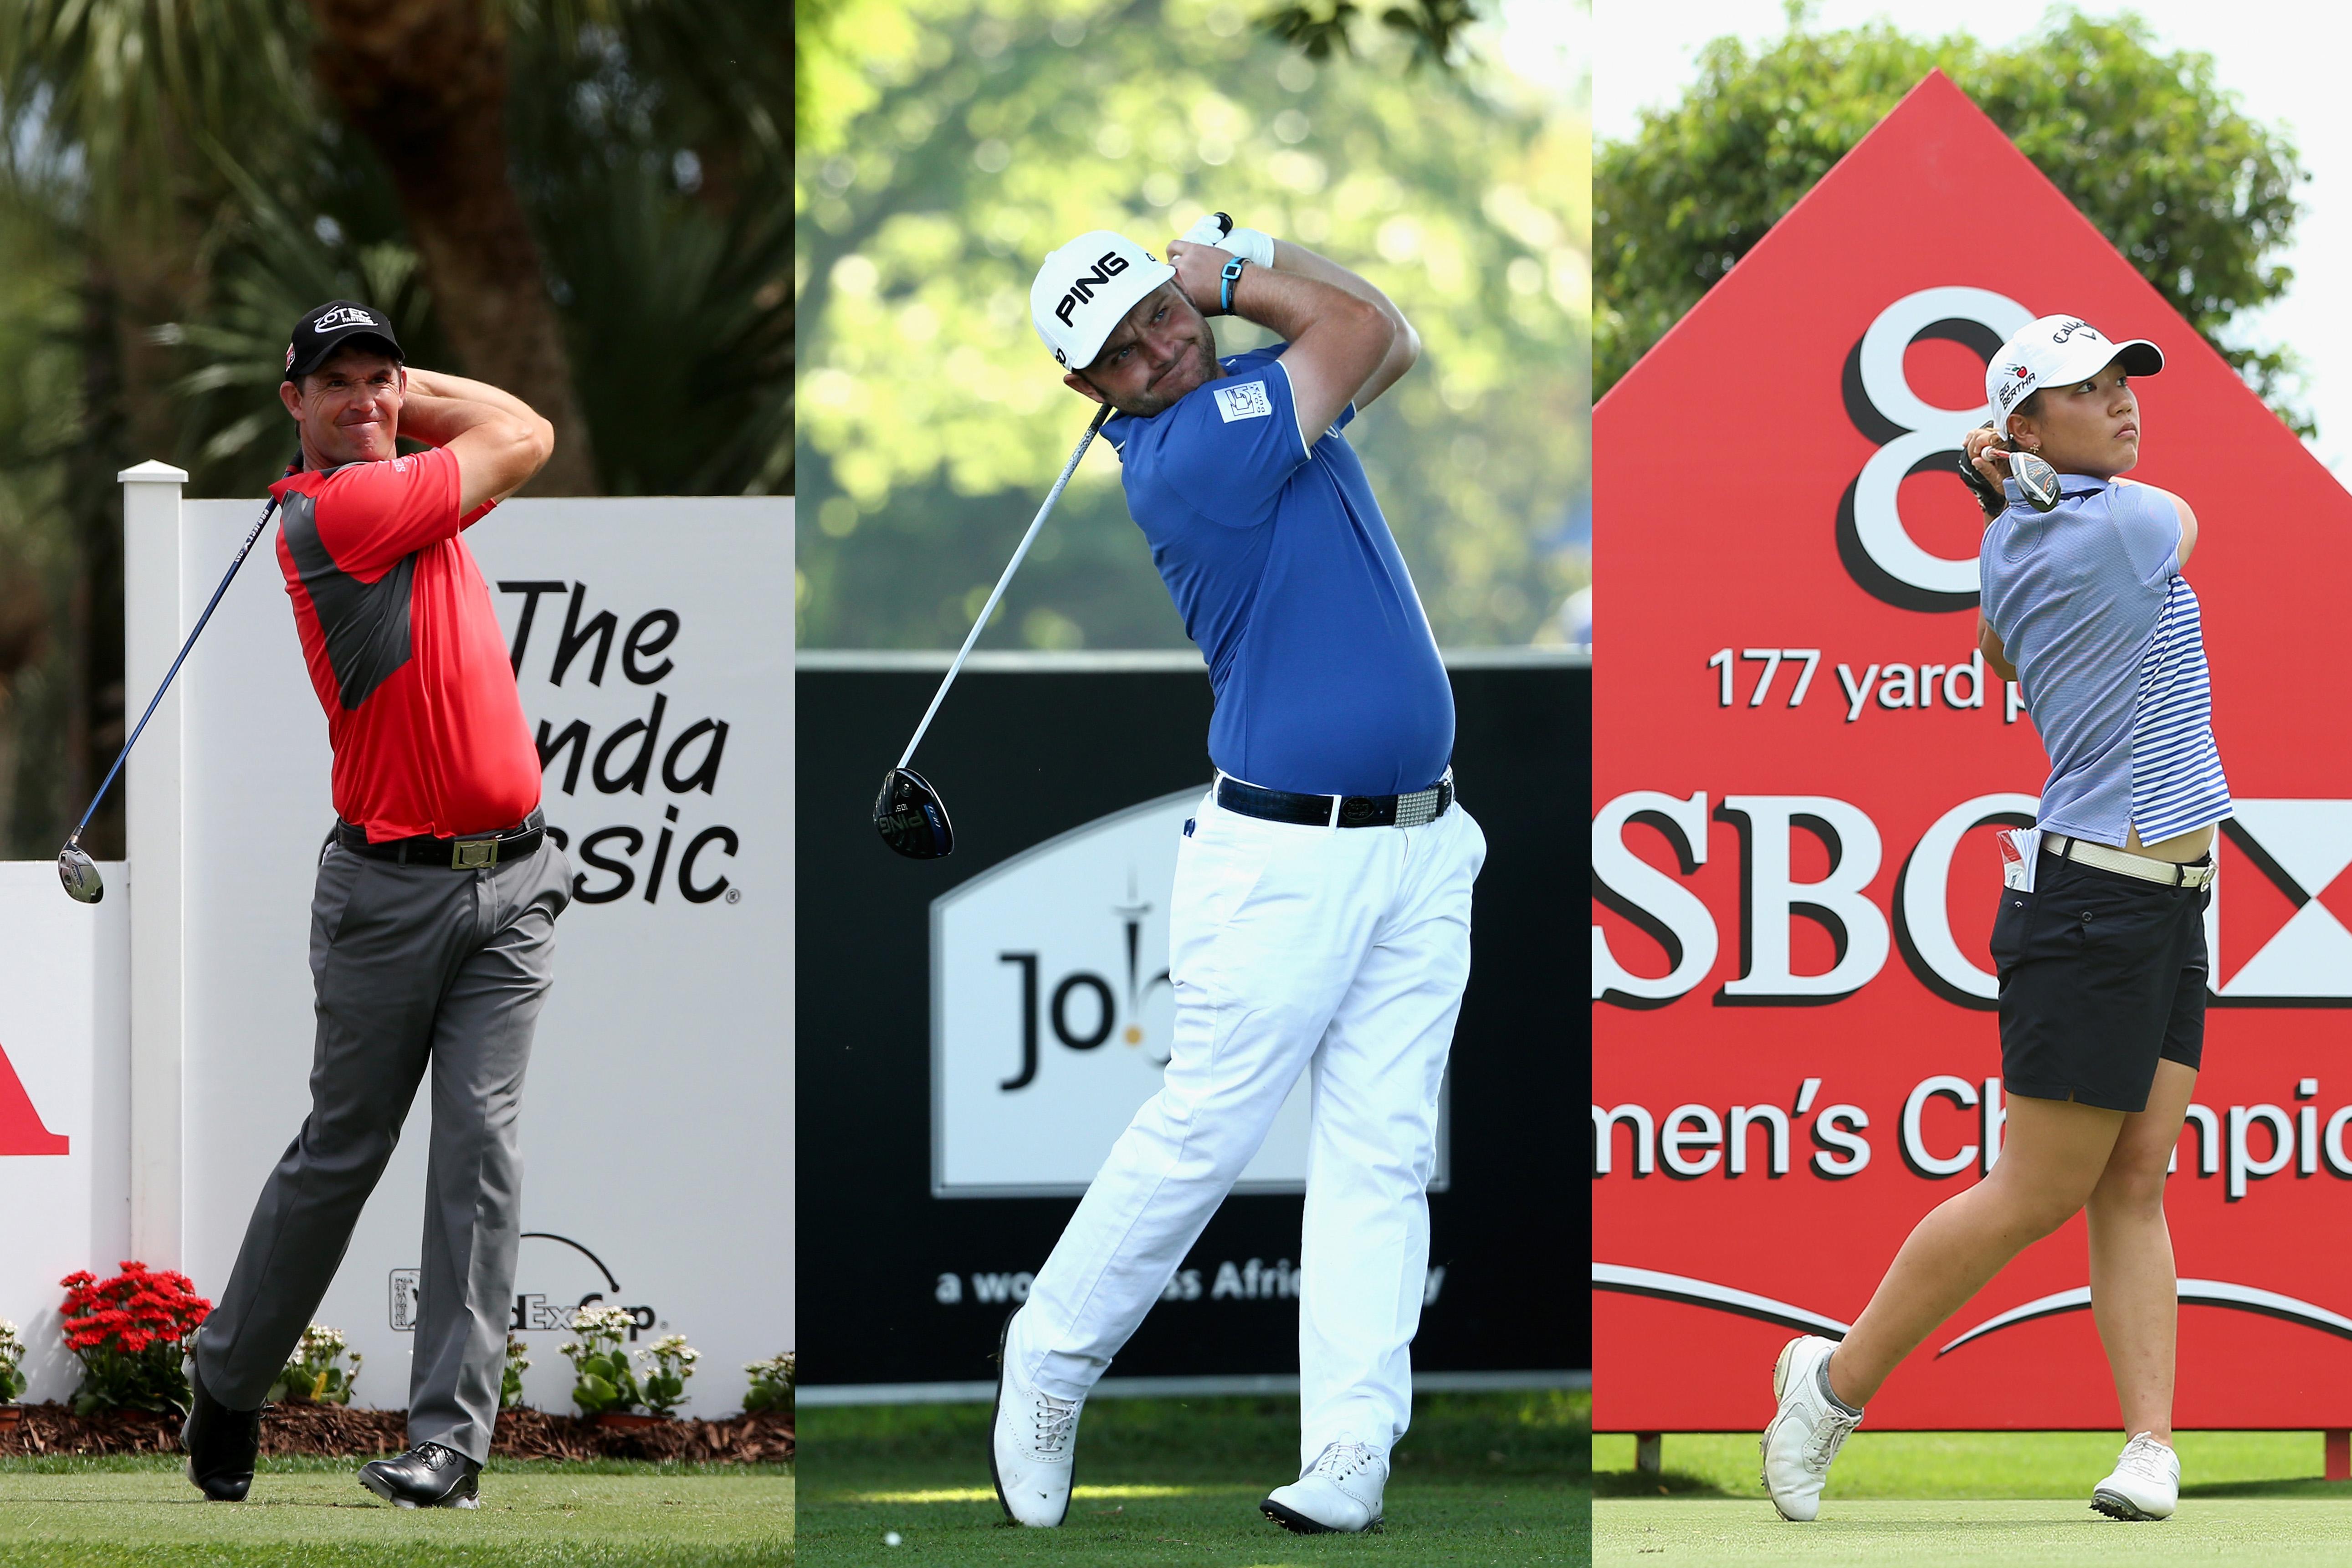 Padraig Harrington, Andy Sullivan and Lydia Ko tasted success this week (Photo: Getty Images)